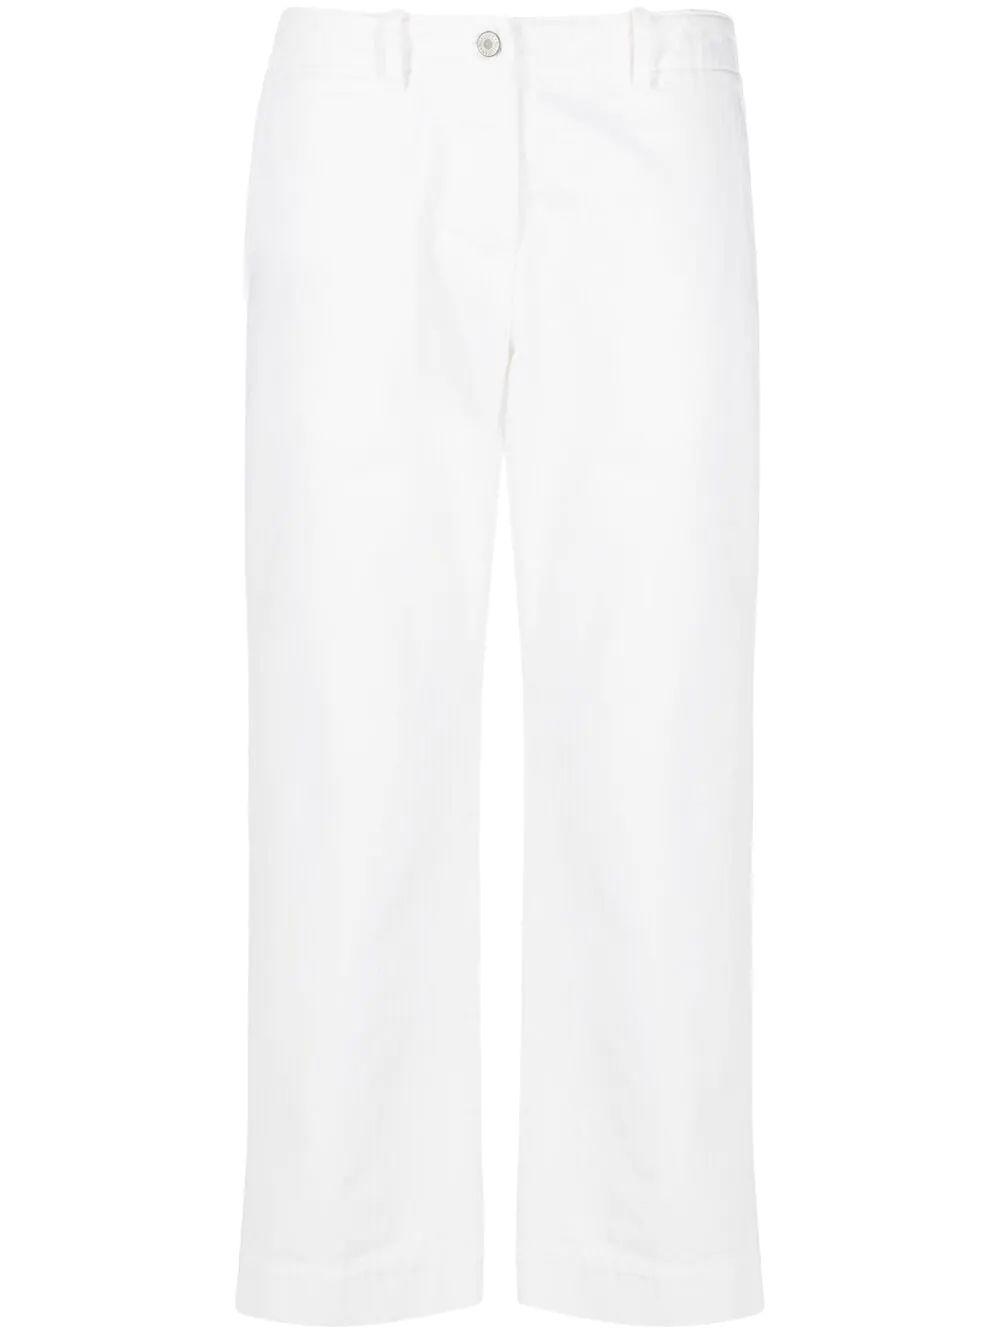 Tomboy Cropped Pant Item # 10776-W737